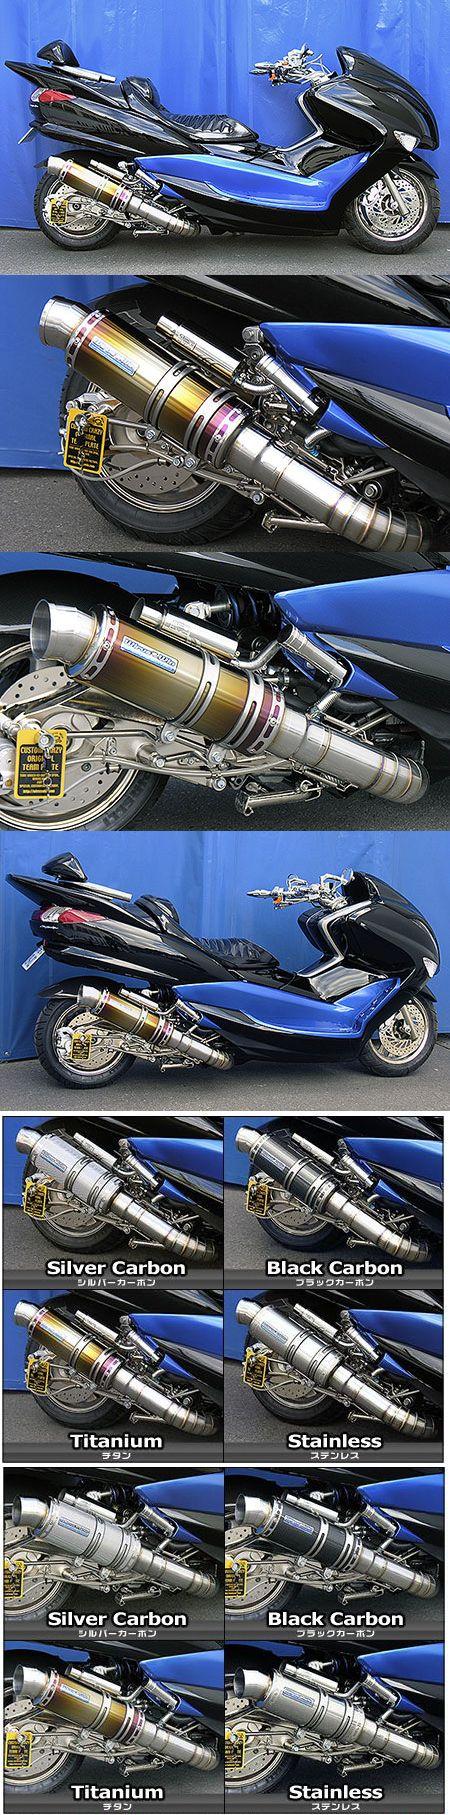 Premium全段排氣管 鈦合金款式 重低音版附觸媒 (排氣淨化觸媒)